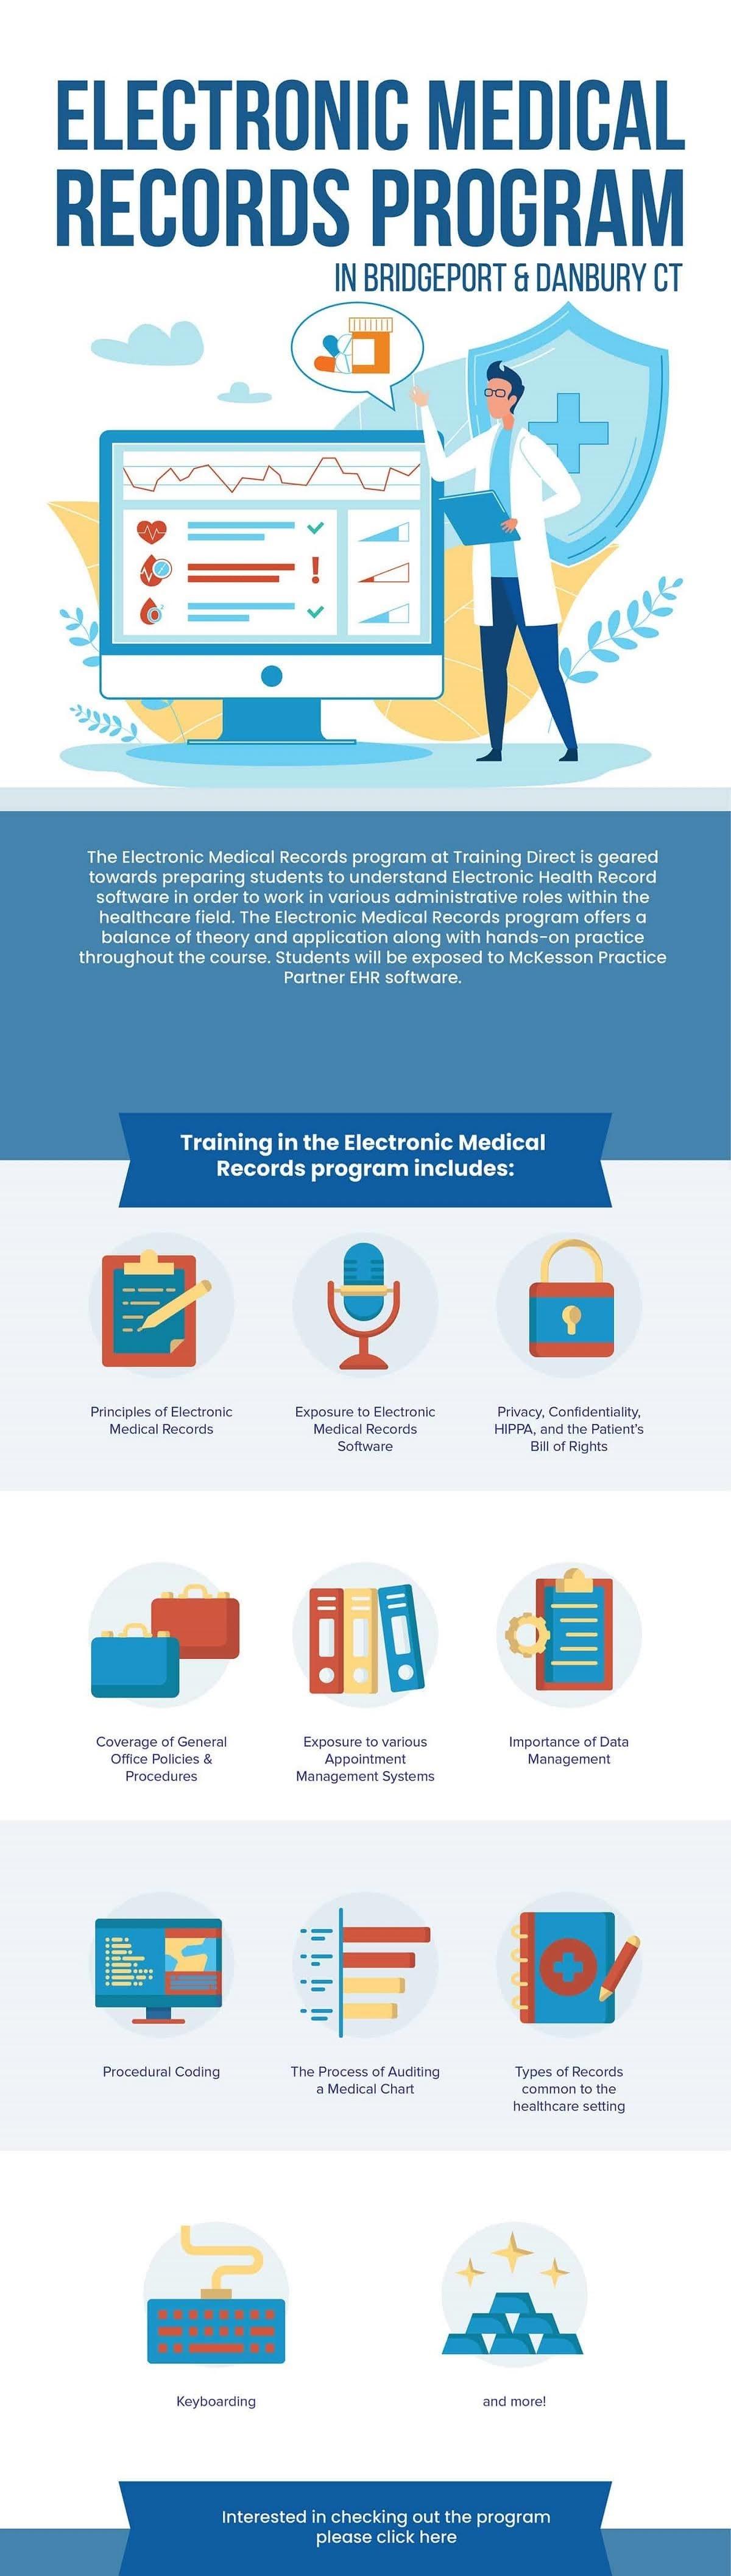 Electronic Medical Records Program in Bridgeport & Danbury CT #infographic